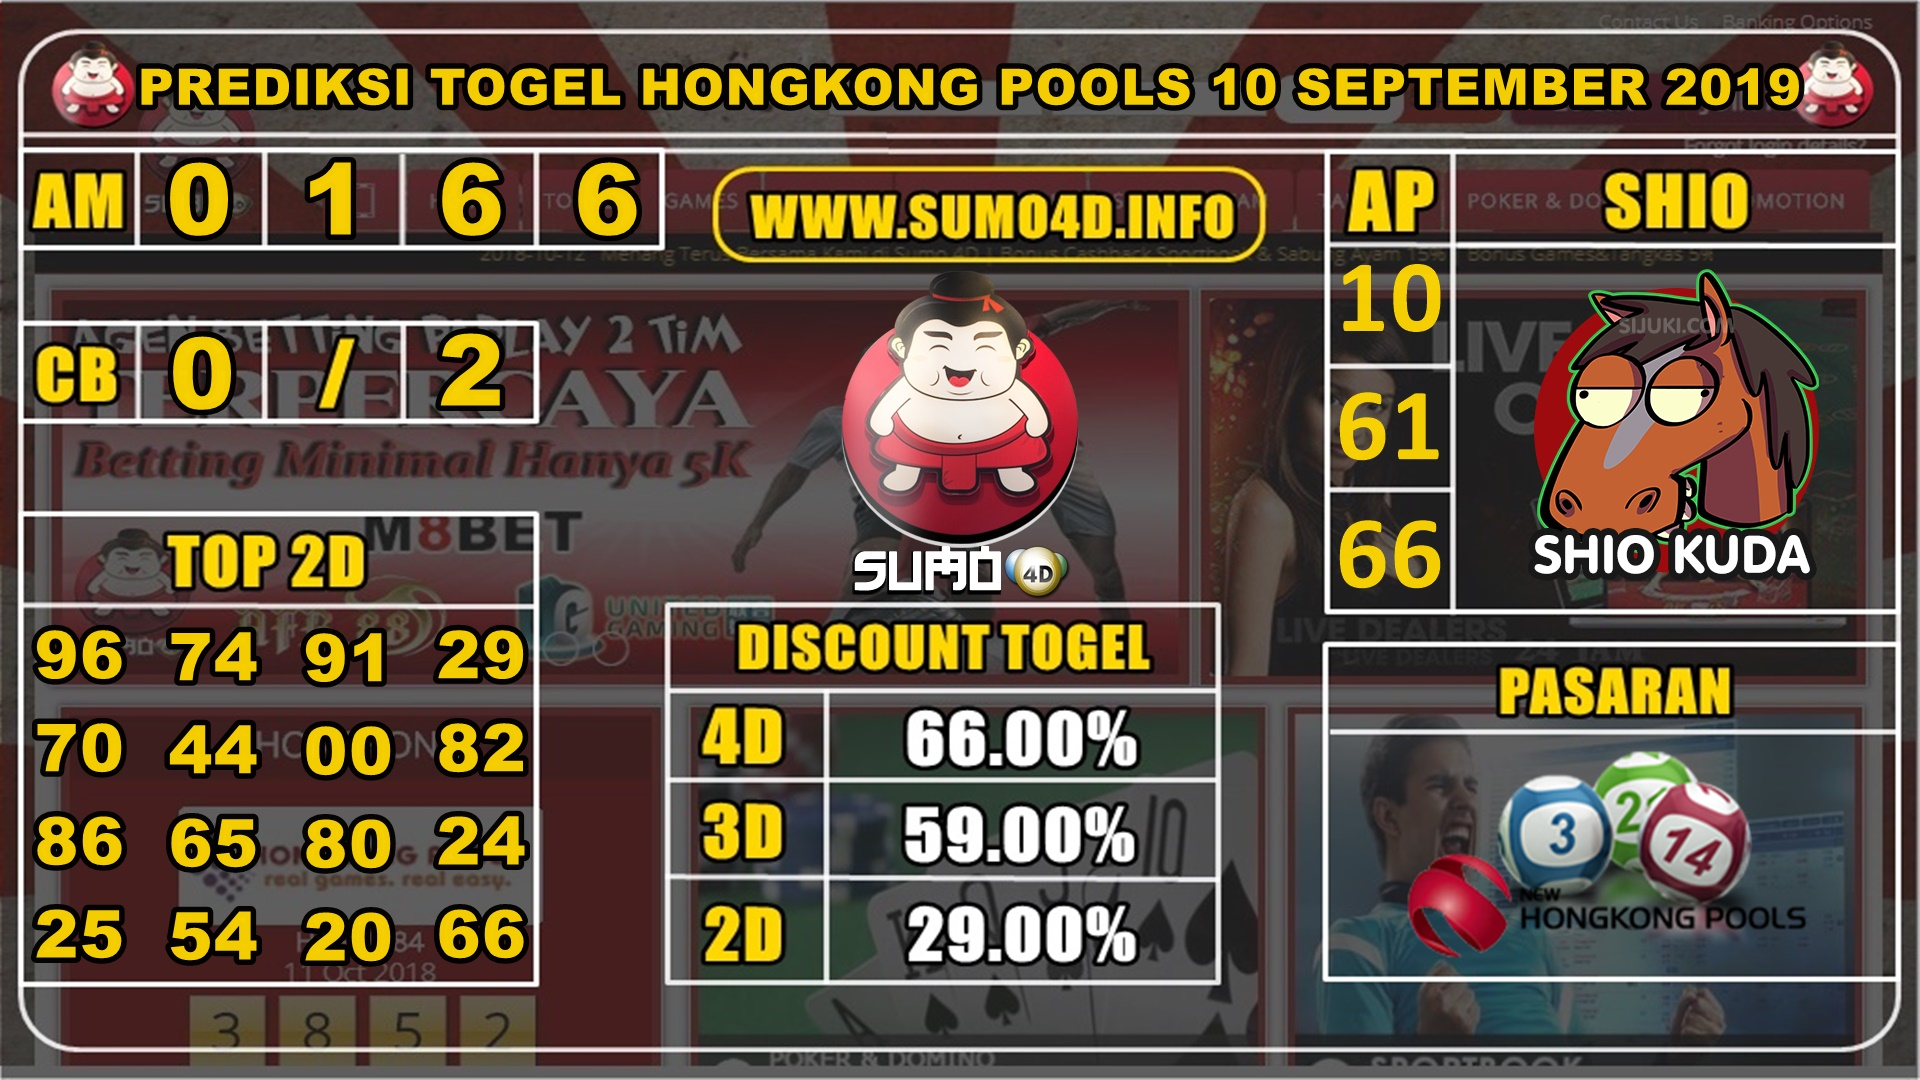 PREDIKSI TOGEL HONGKONG POOLS 10 SEPTEMBER 2019